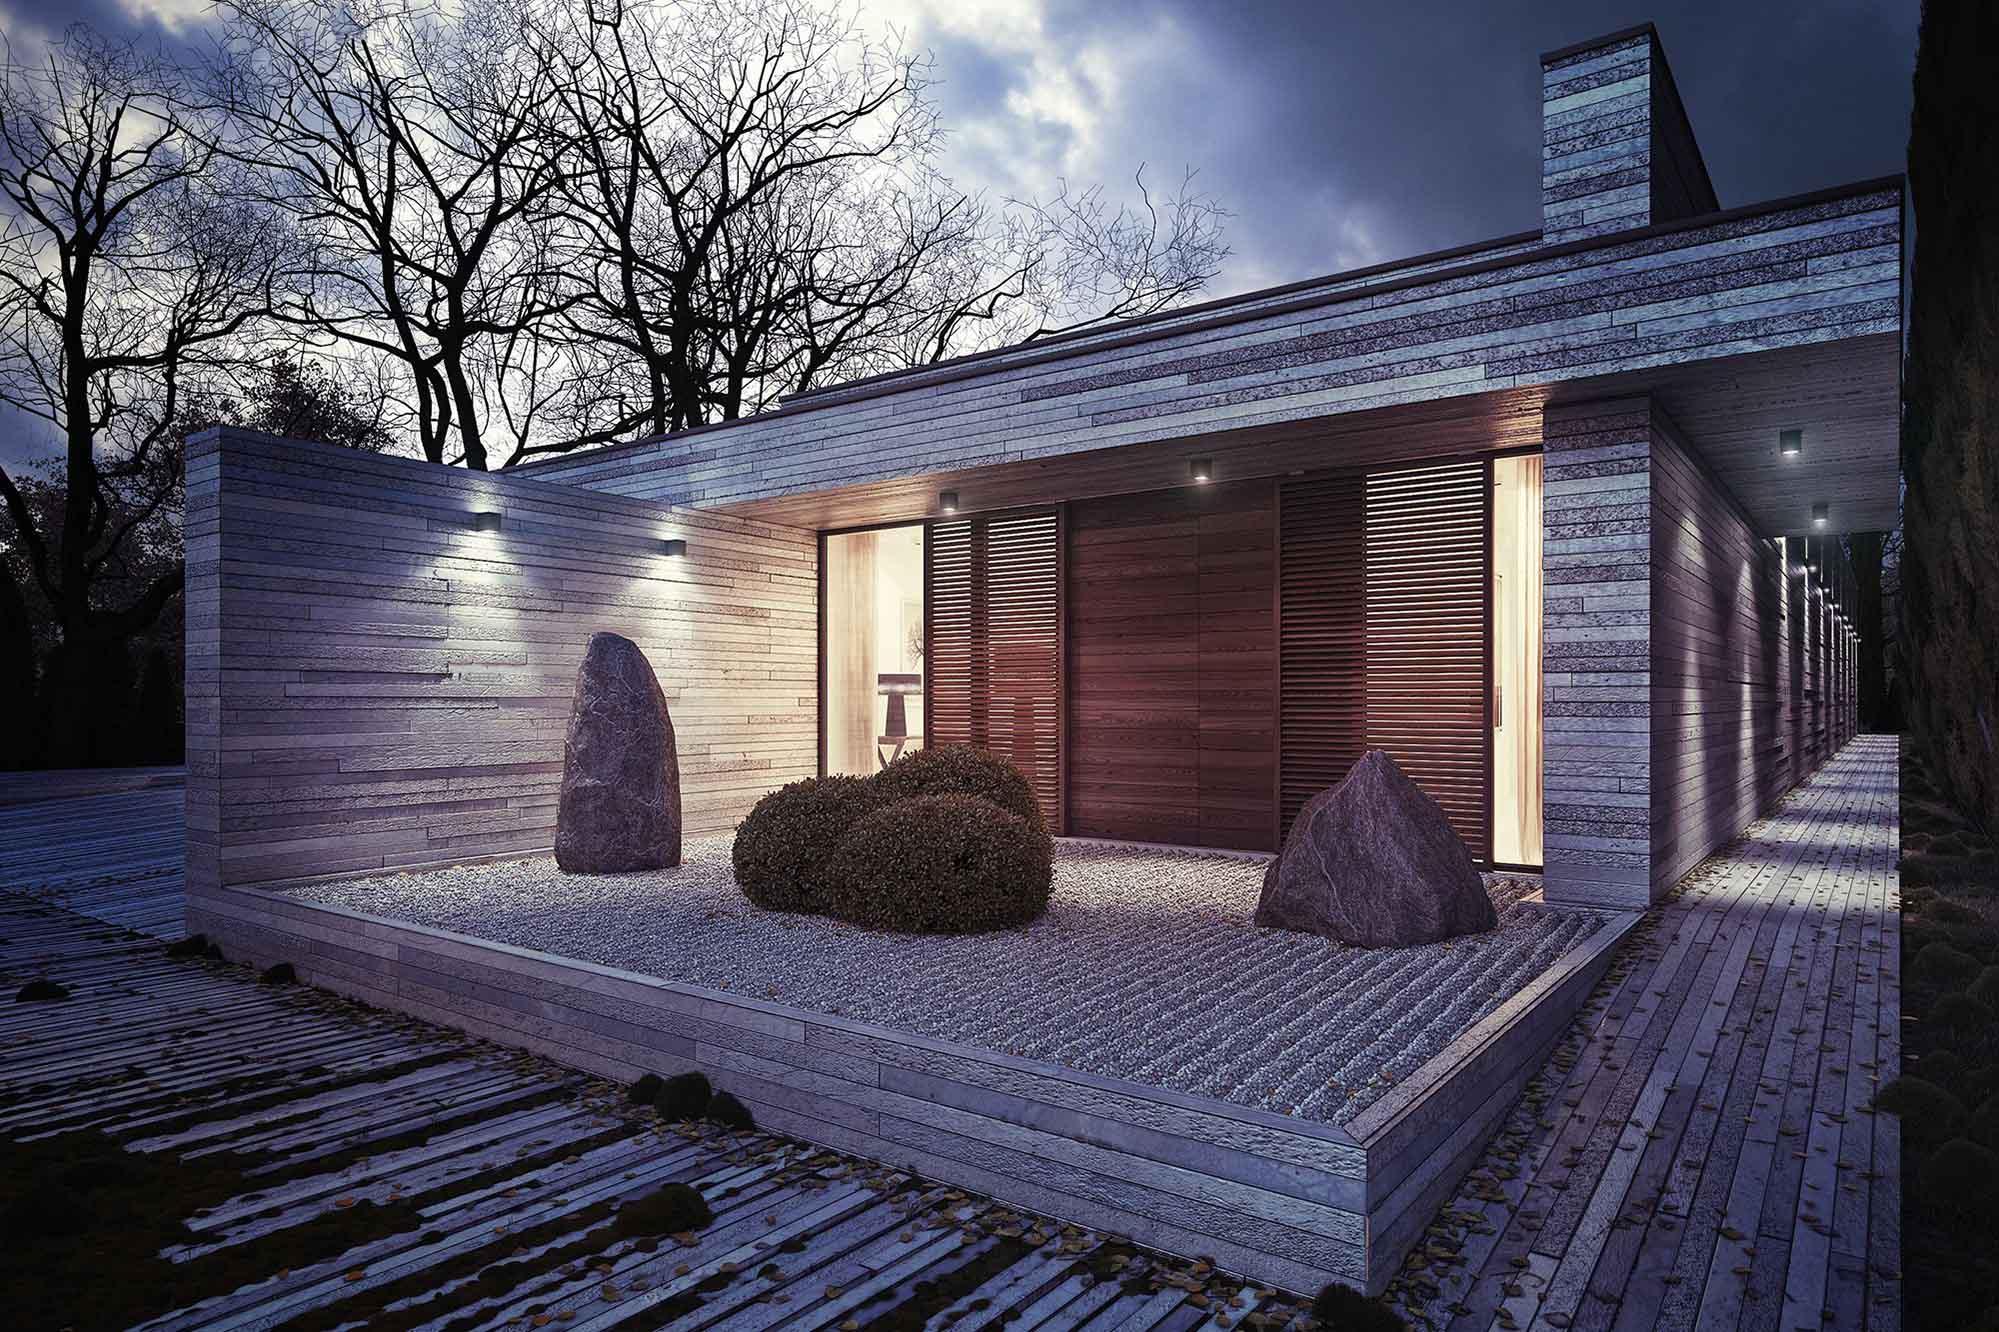 Horizontal_house_06_81.waw.pl-300dpi